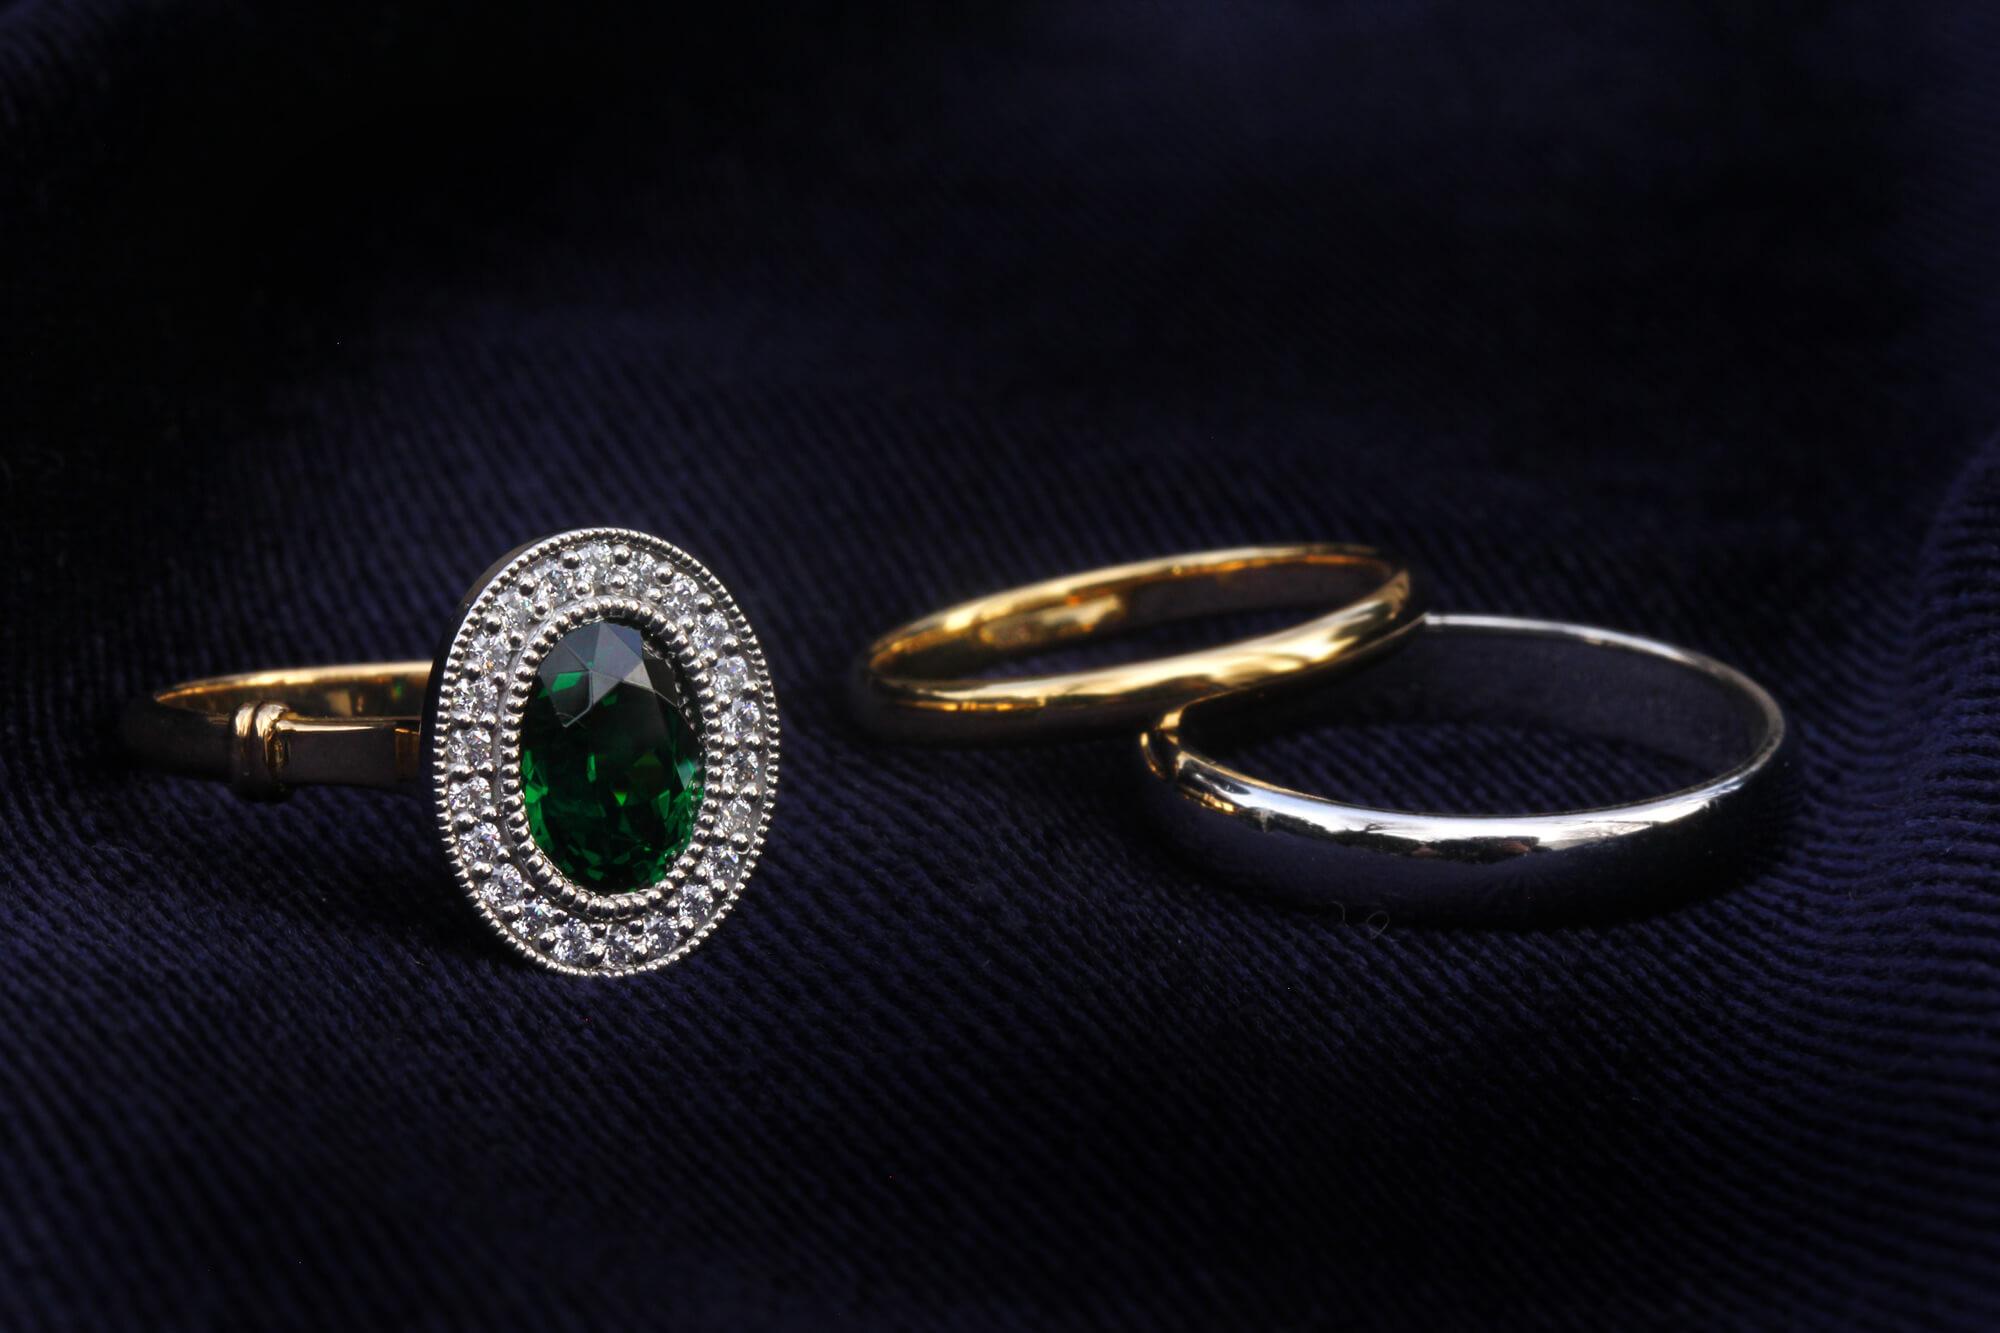 Color stone engage / mariage ring のオーダーについて